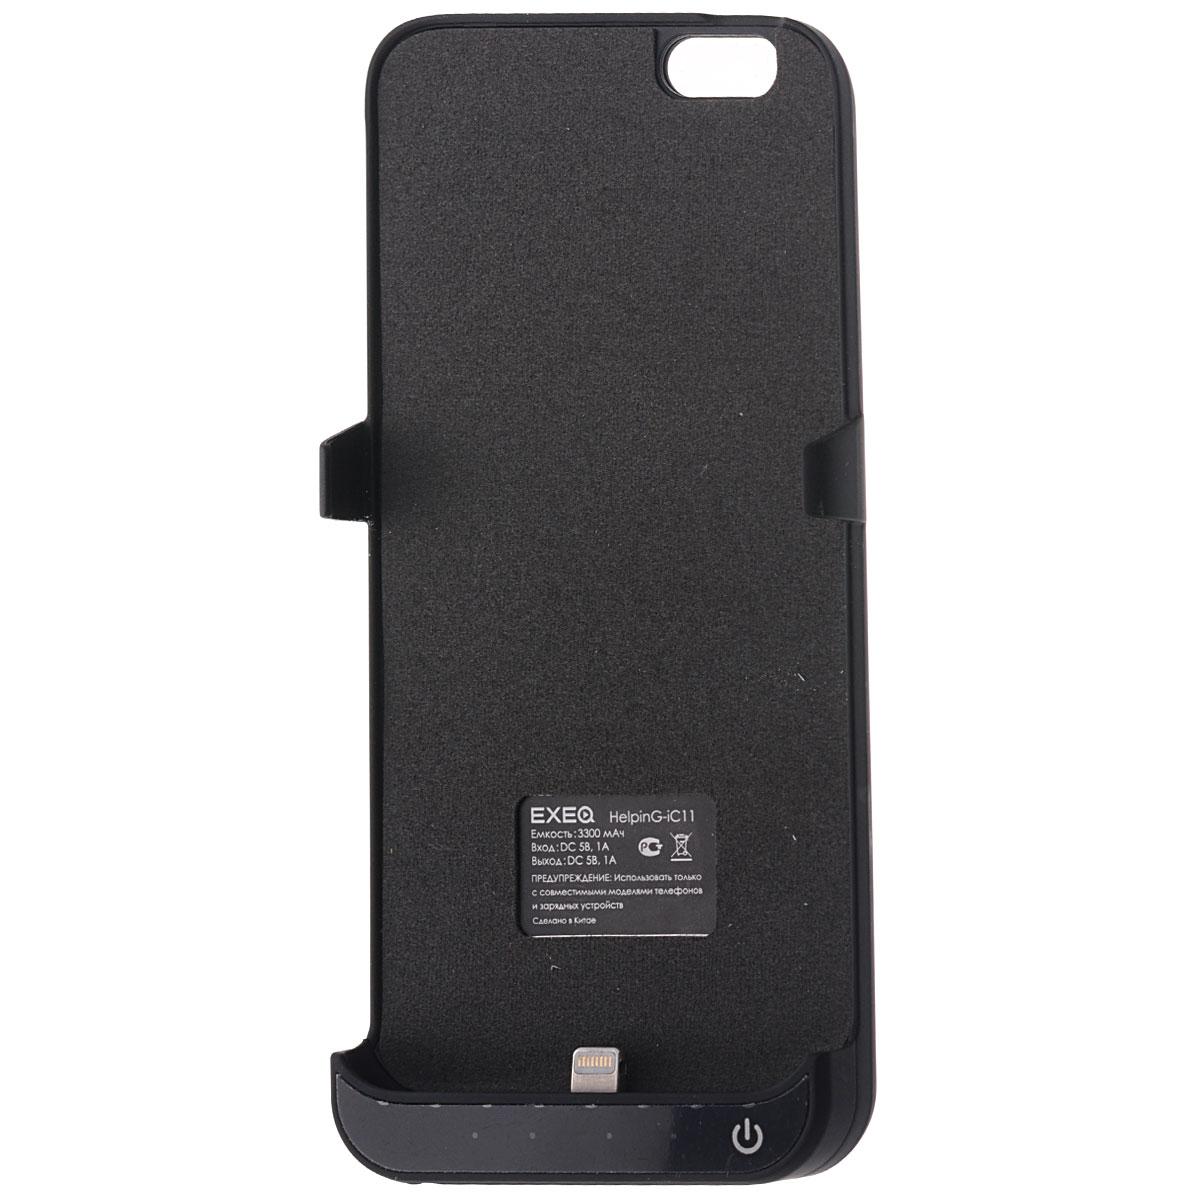 EXEQ HelpinG-iC11 чехол-аккумулятор для iPhone 6, Black (3300 мАч, клип-кейс)HelpinG-iC11 BL